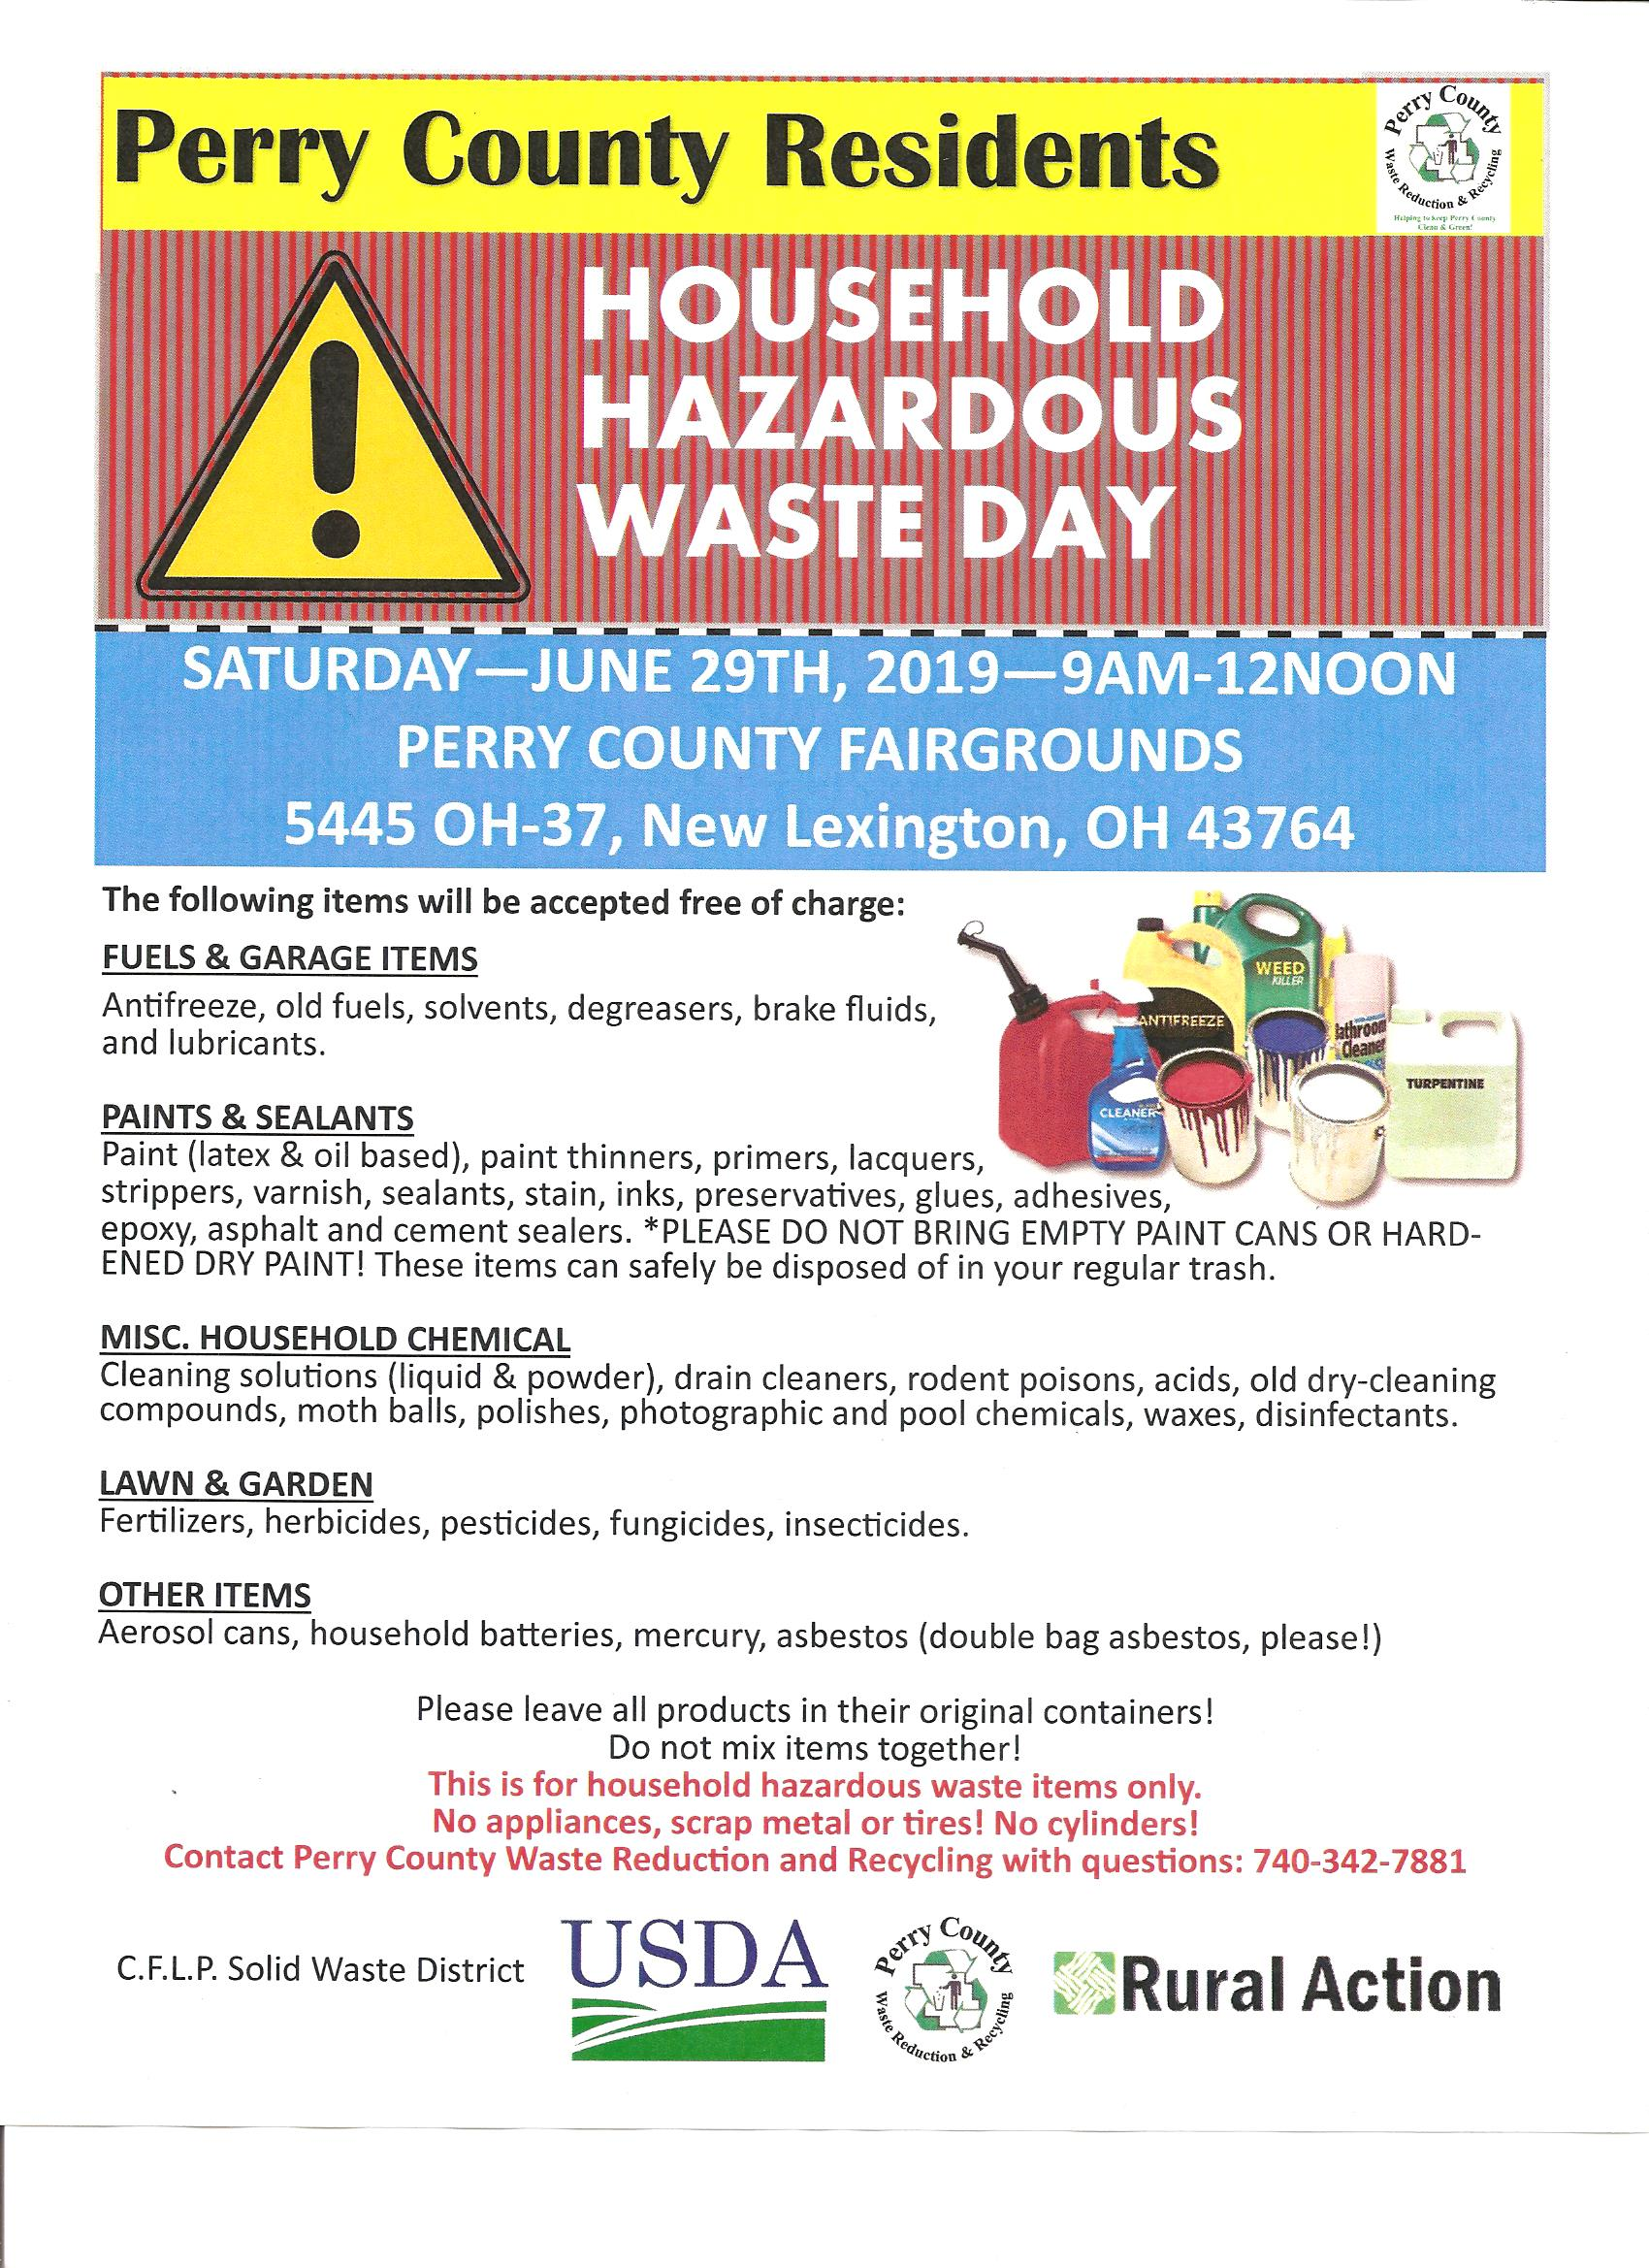 Perry County Household Hazardous Waste Day